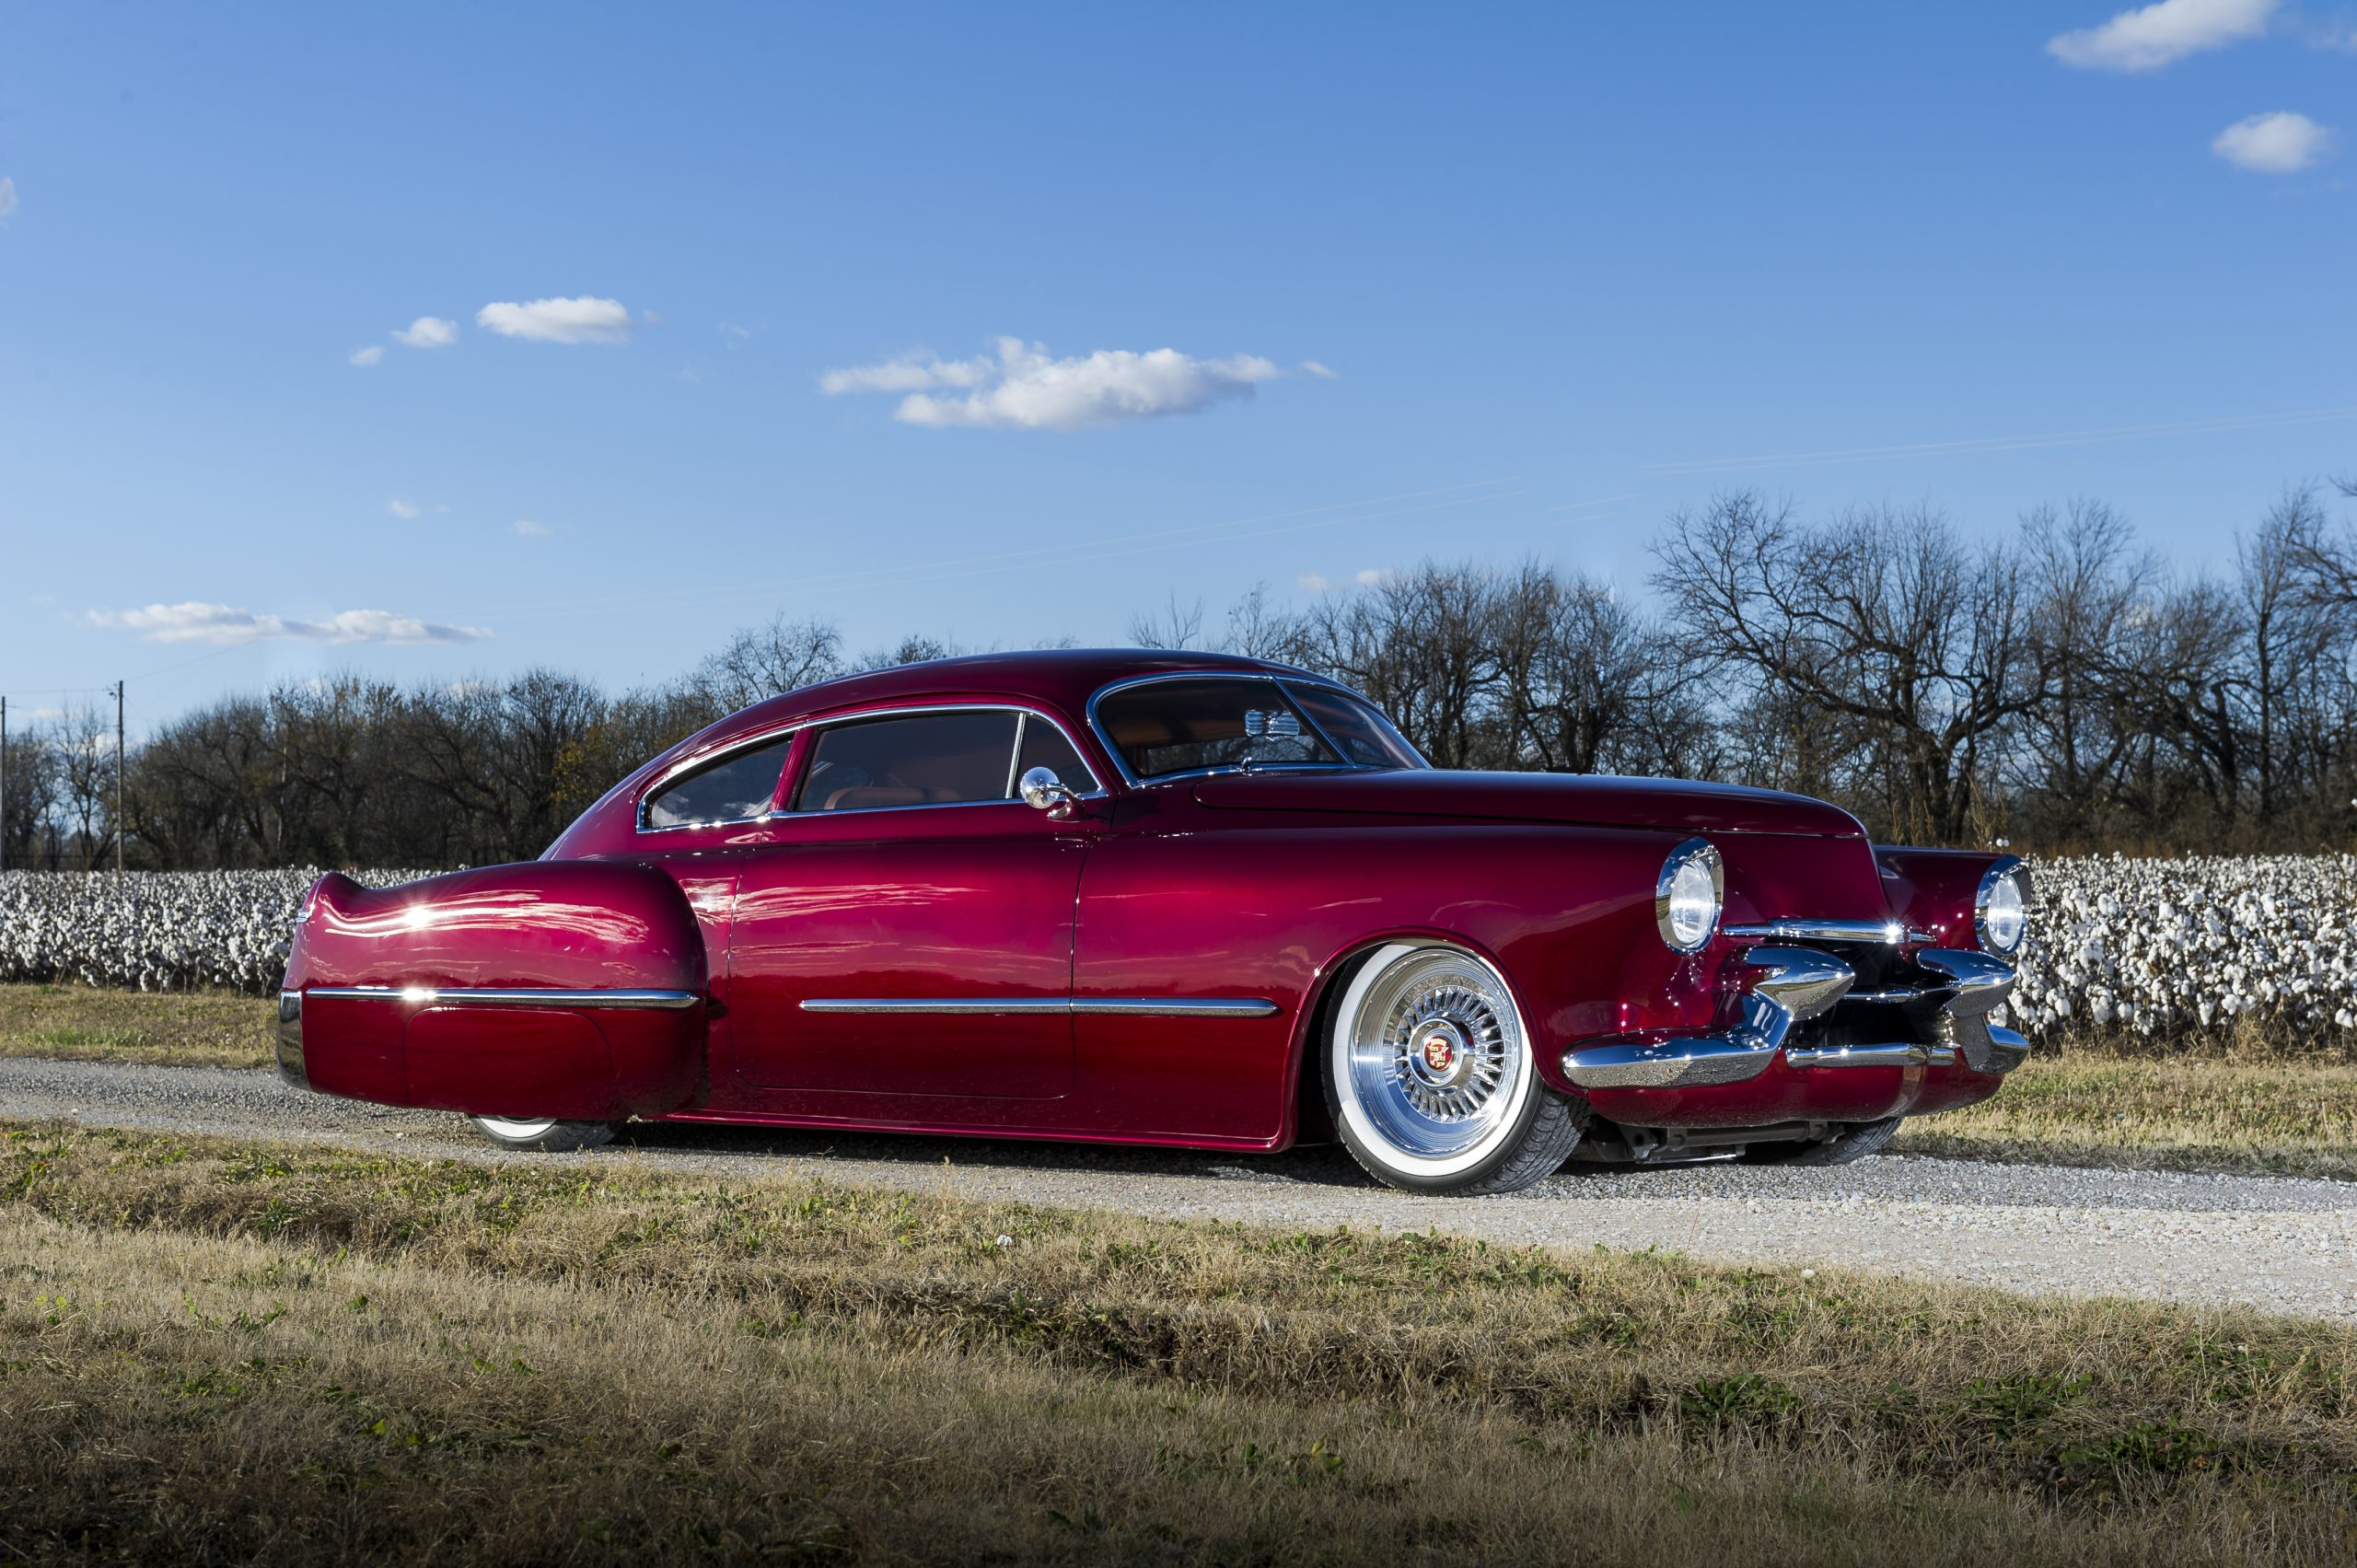 Chris Carlson's 1949 Cadillac Sedanette